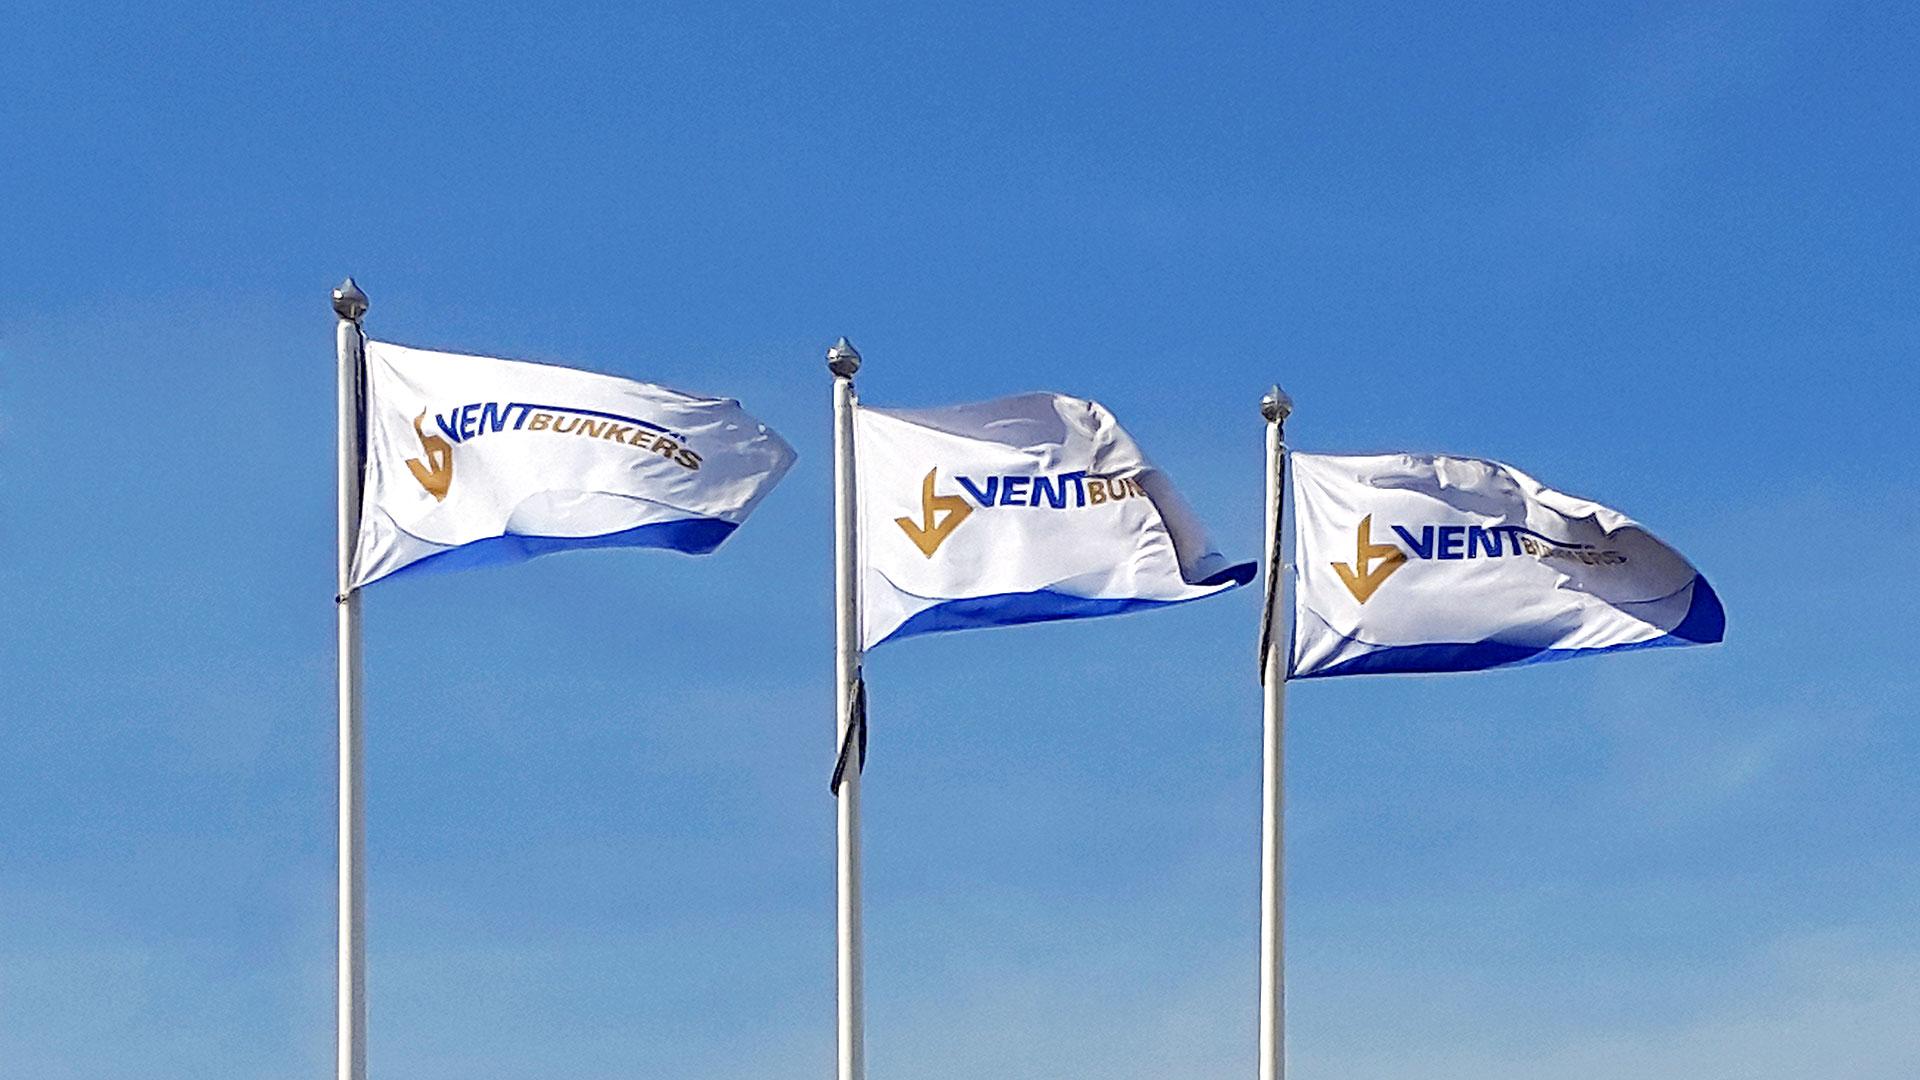 Reklāmdruka Ventbunkers karogi